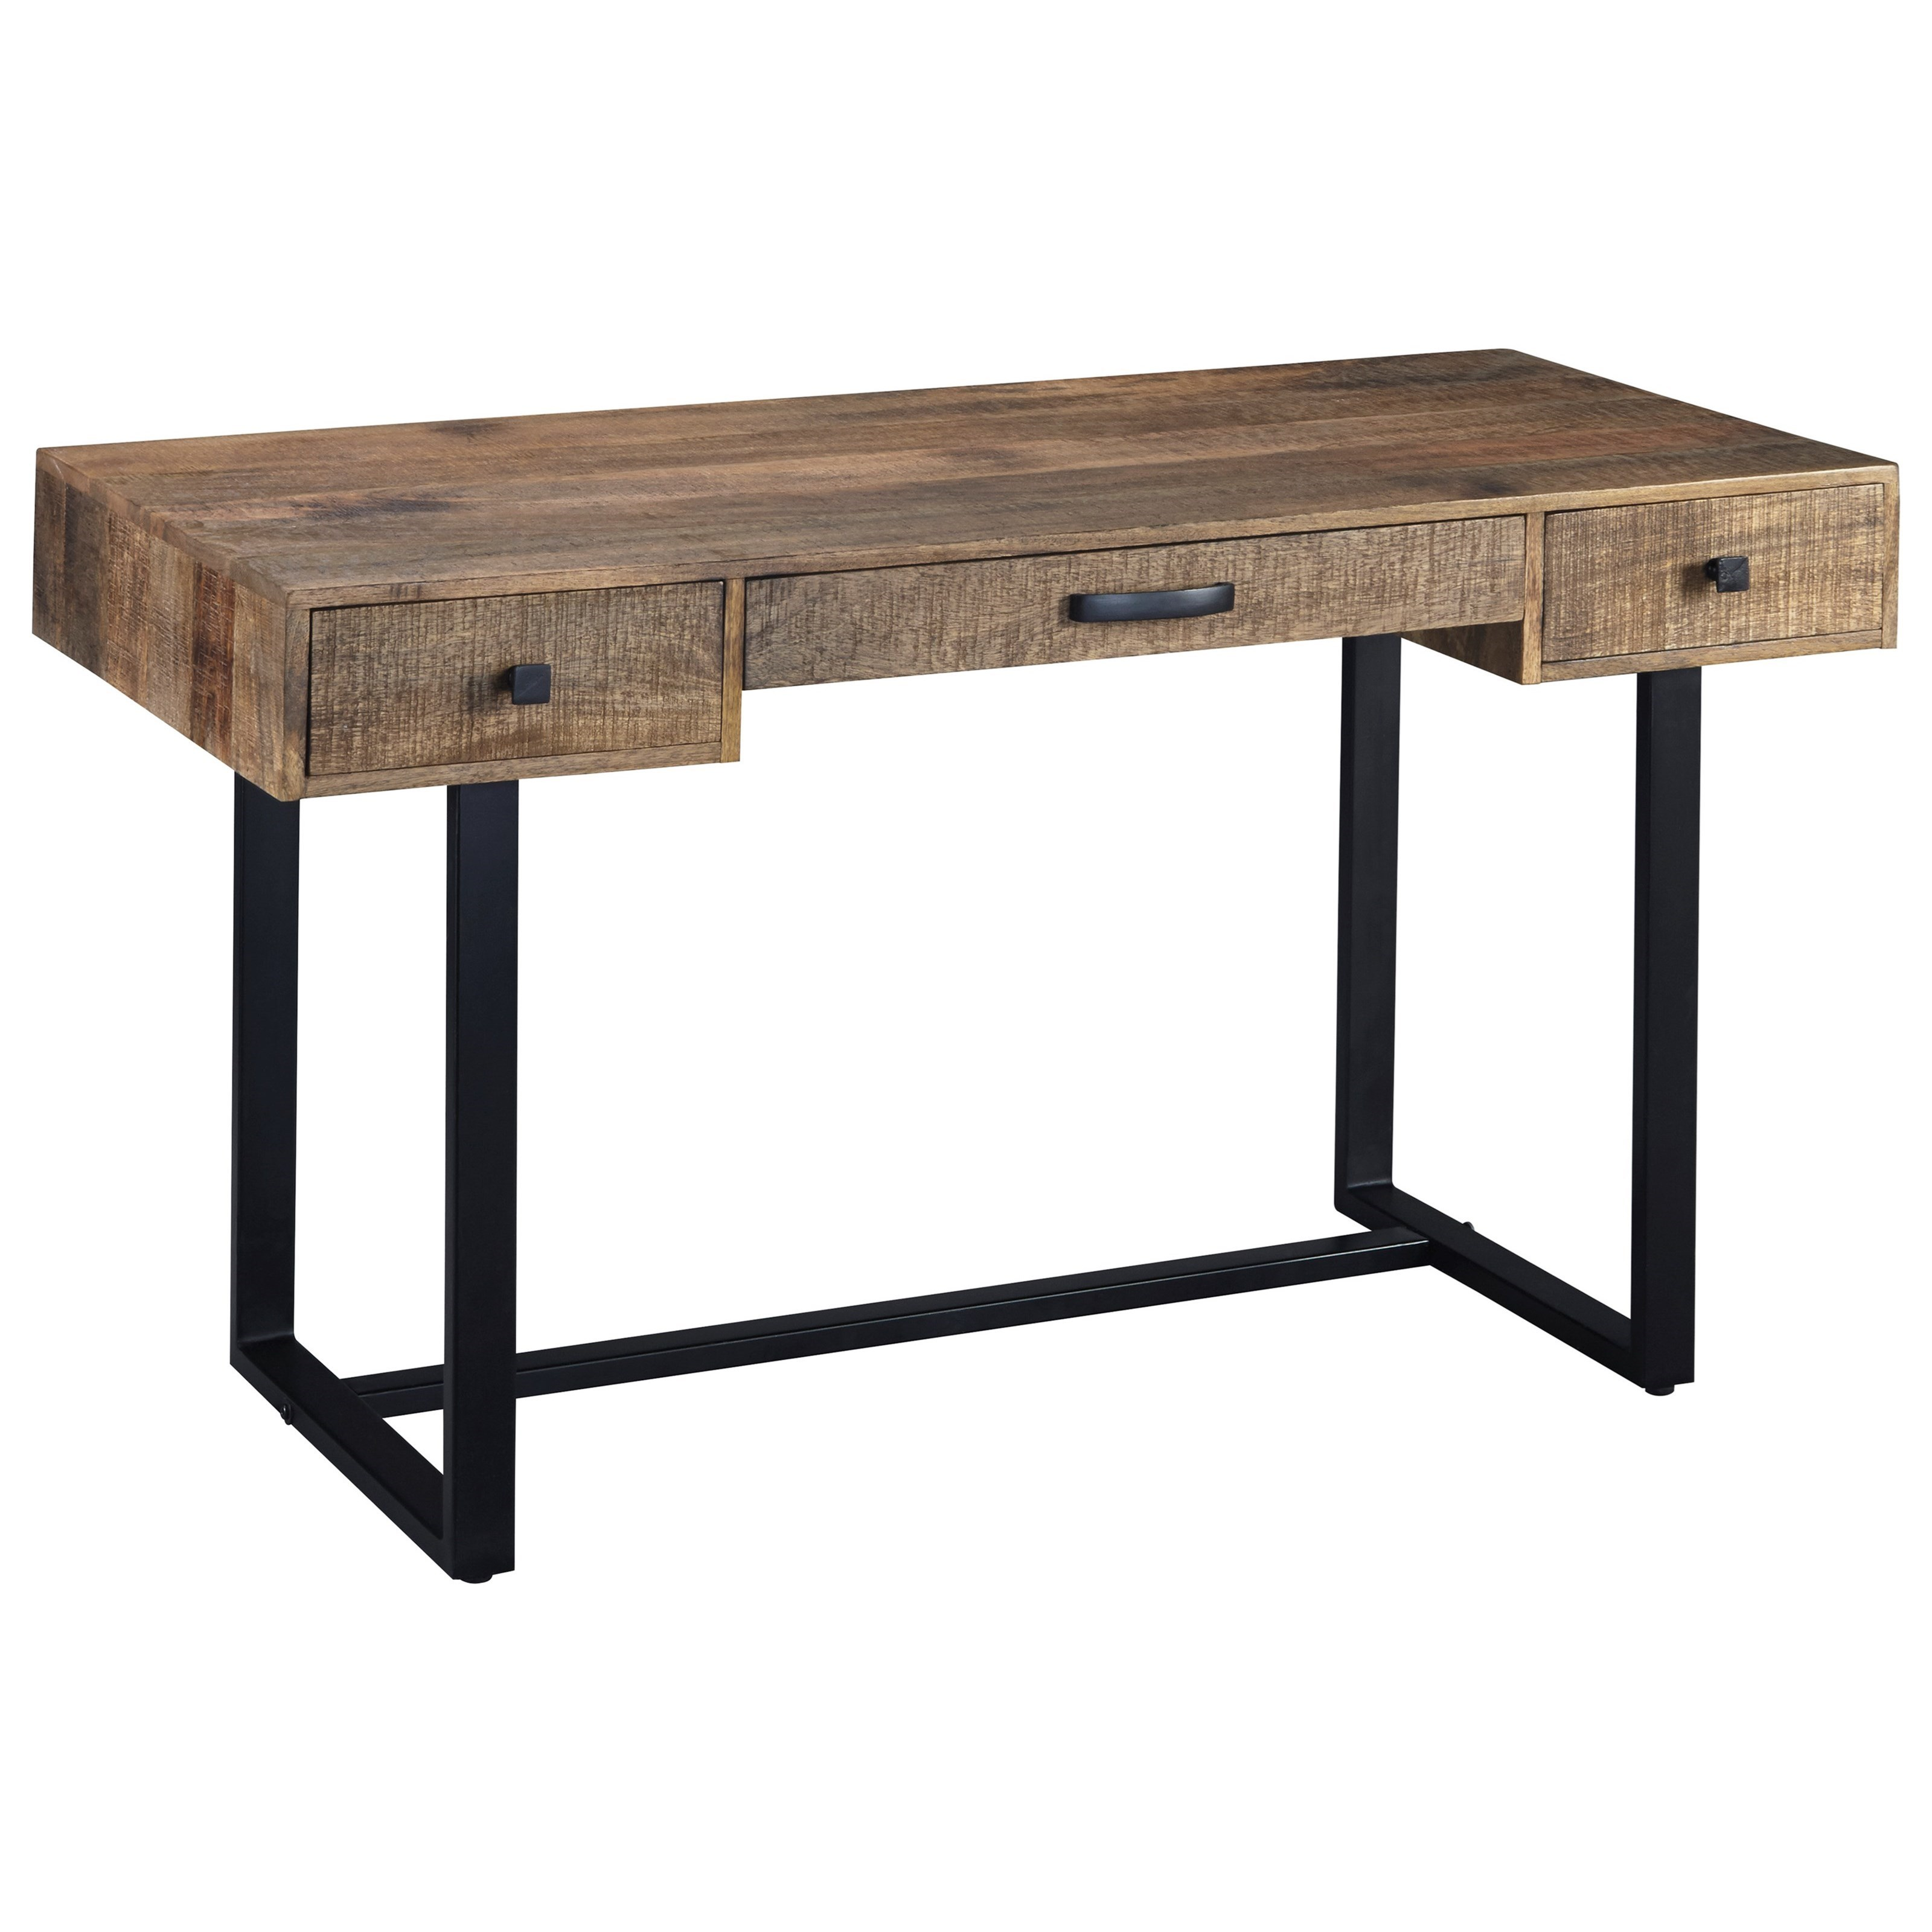 Signature Design By Ashley Viganni H640 26 Mango Wood/Metal Home Office  Desk | Household Furniture | Table Desks/Writing Desks